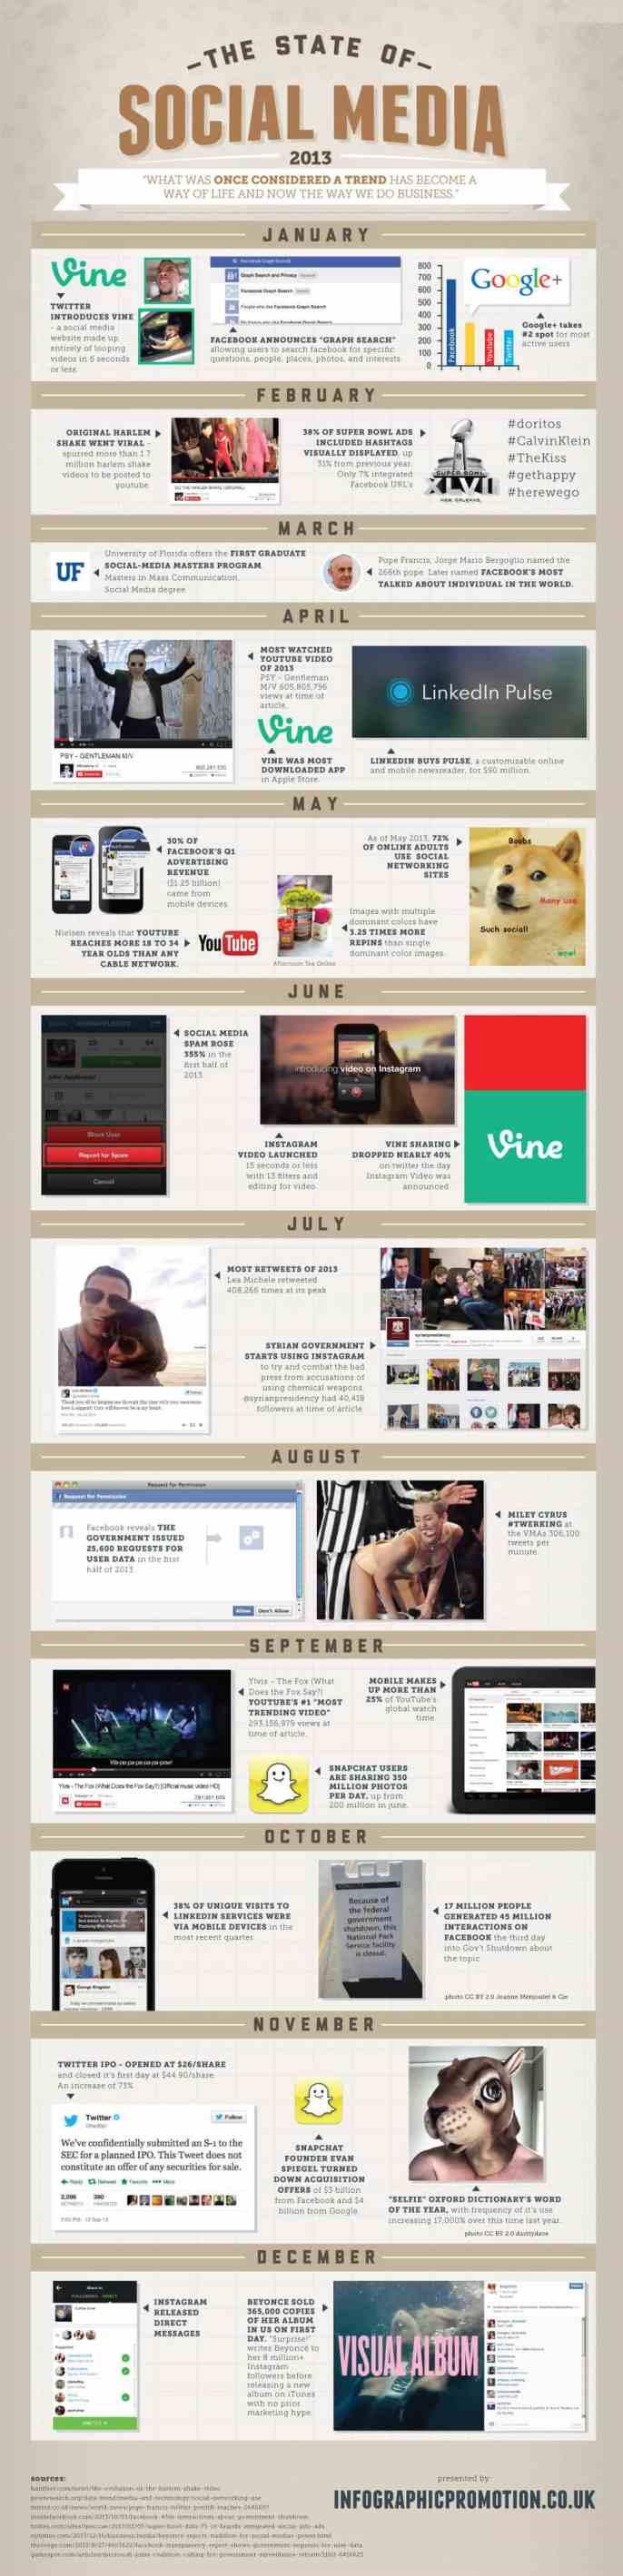 state-of-social-media-2013[1]